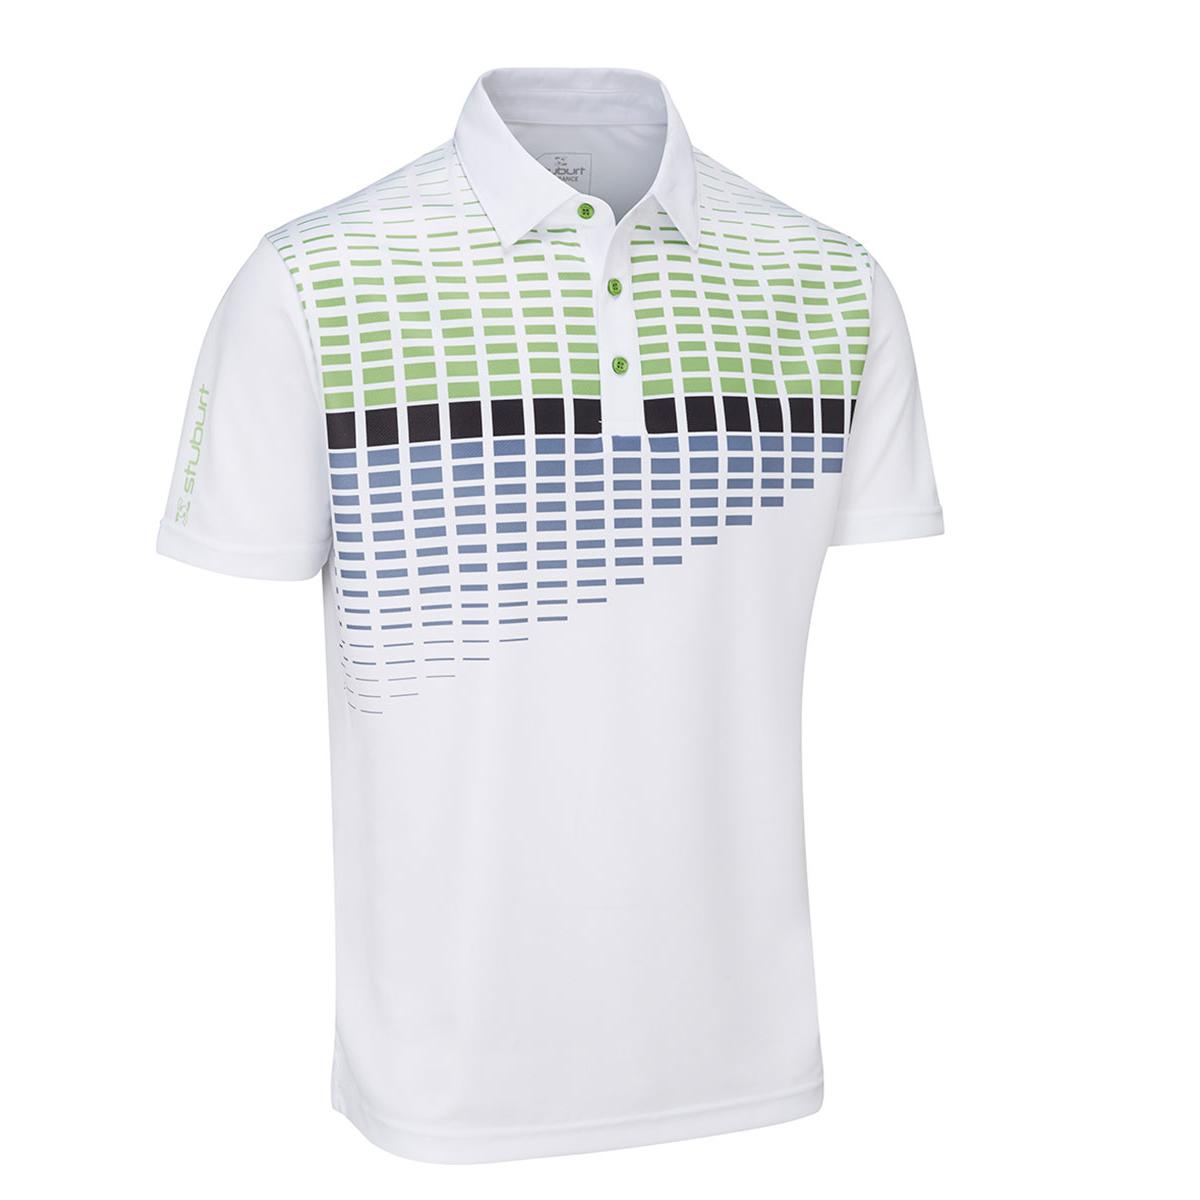 34a216b9f Stuburt Endurance Block Polo Shirt   Online Golf